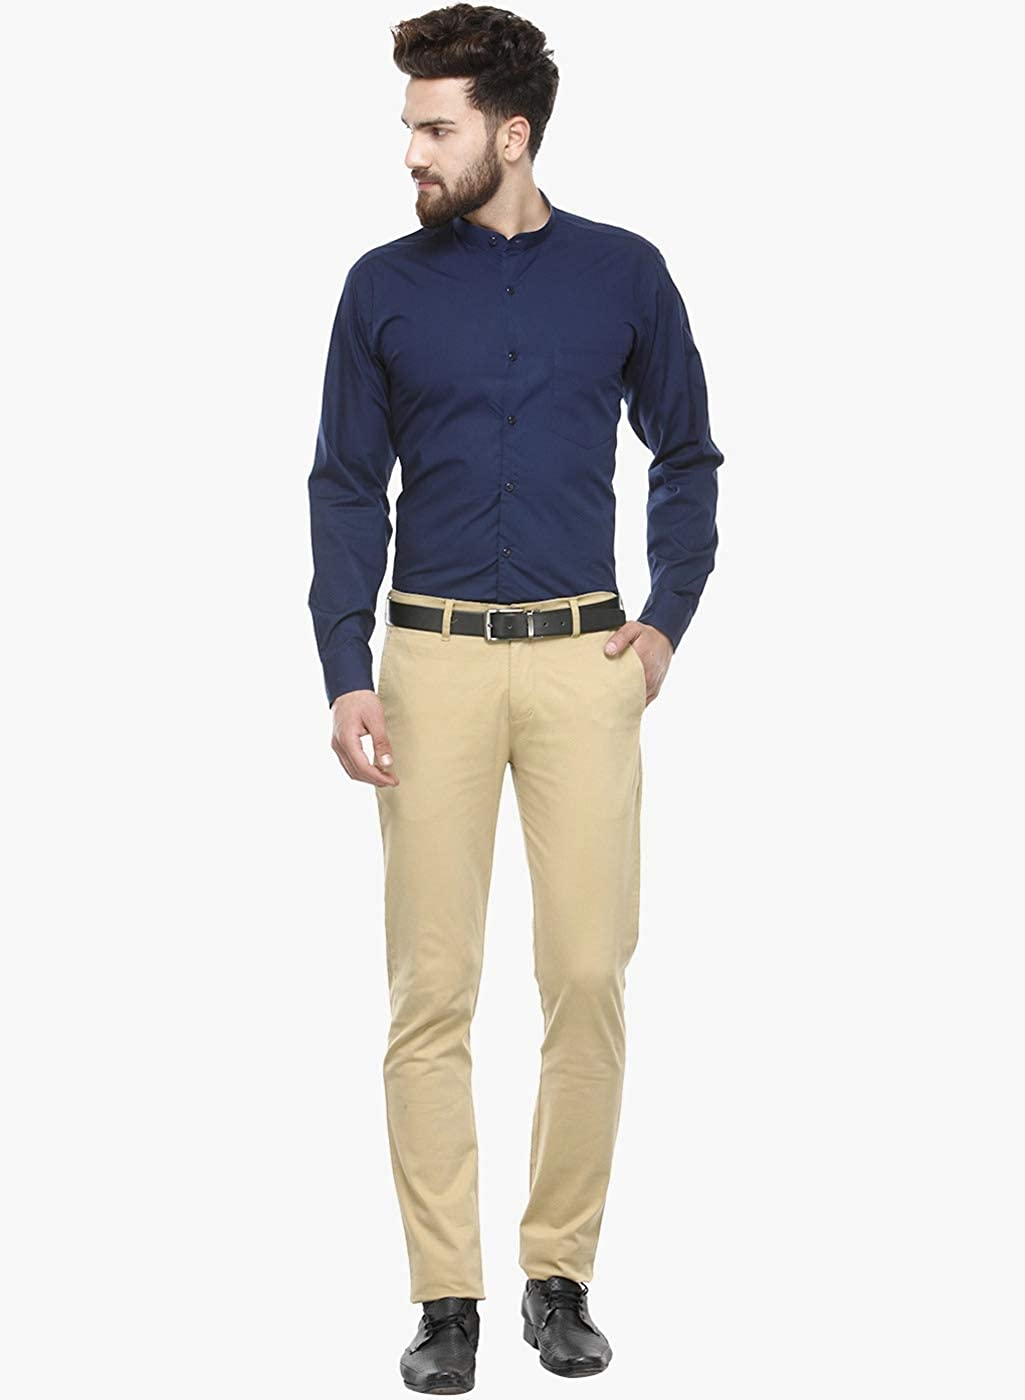 Leda Cotton Navy-Blue Party Wear Button-Down Collar Mens Formal Shirt